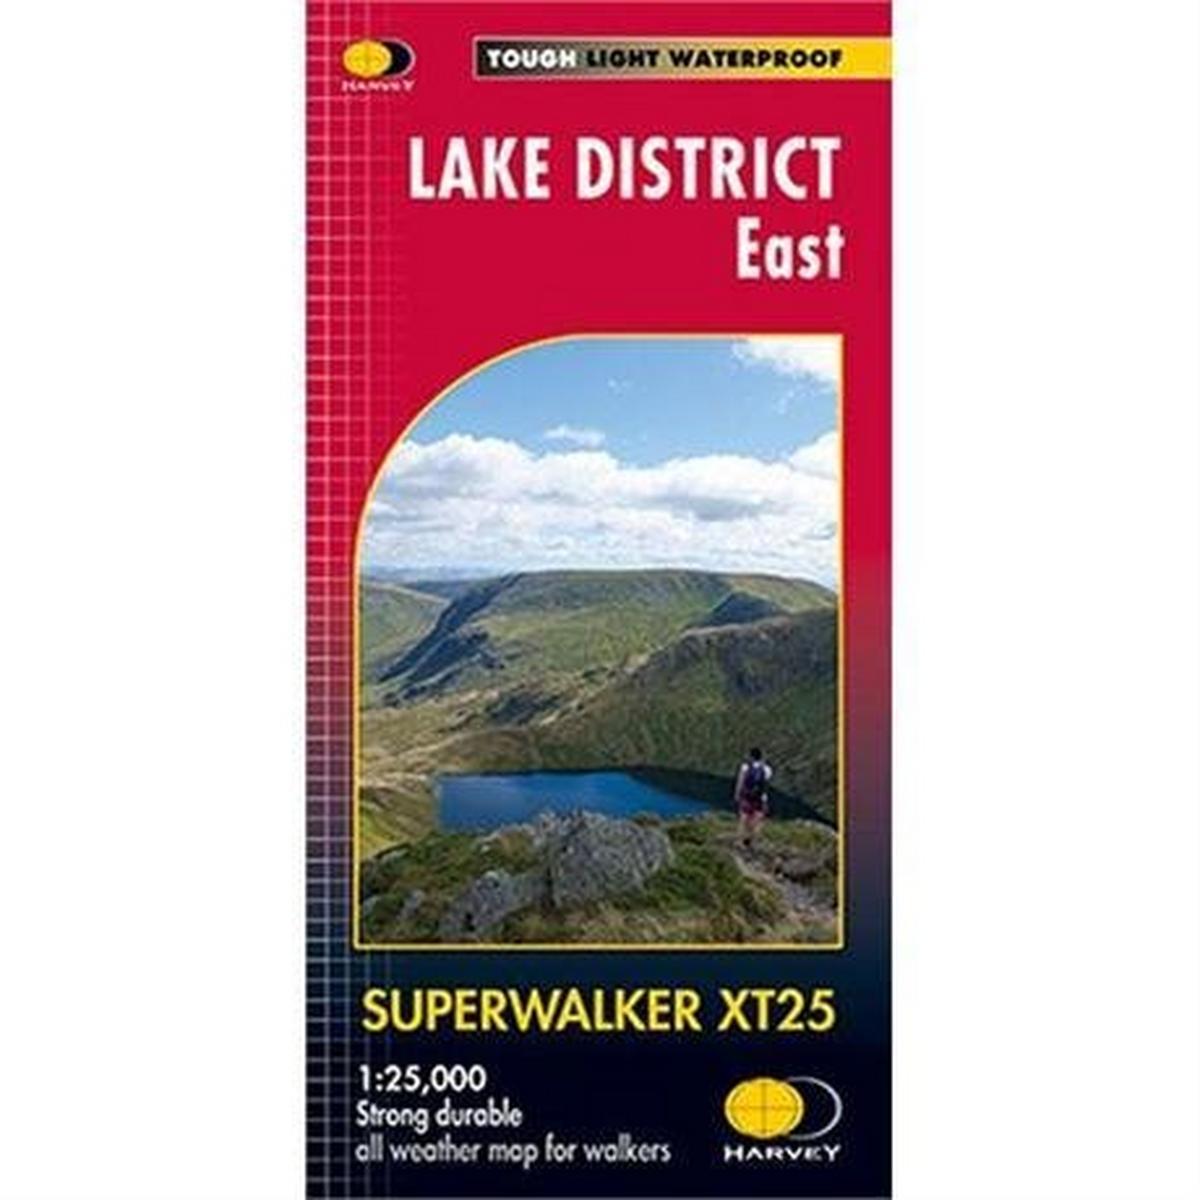 Harveys Harvey Map - Superwalker XT25: Lake District - East